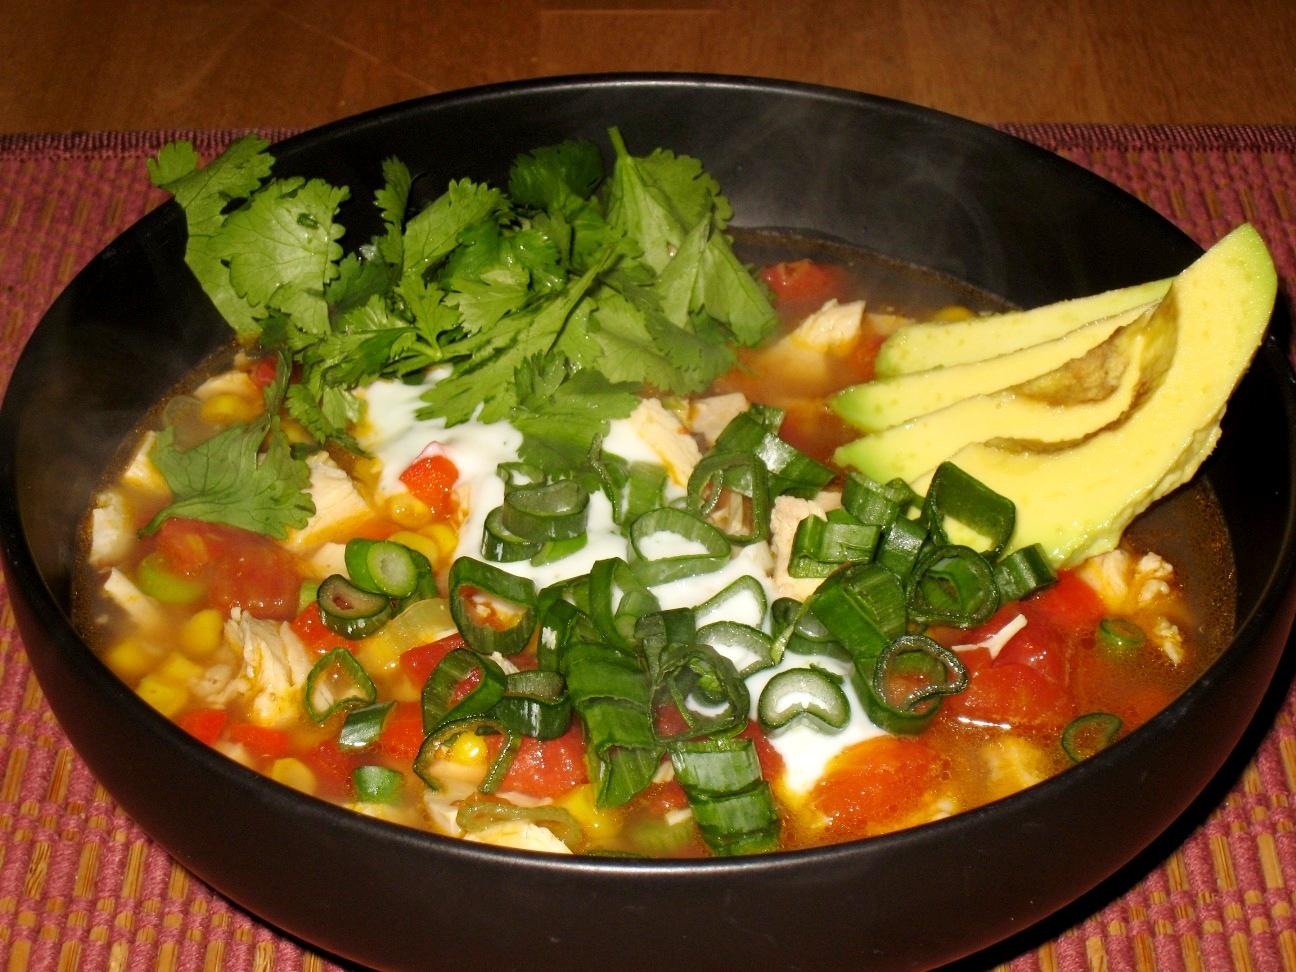 Global Grub: Chipotle Chicken Soup with Lime Crema